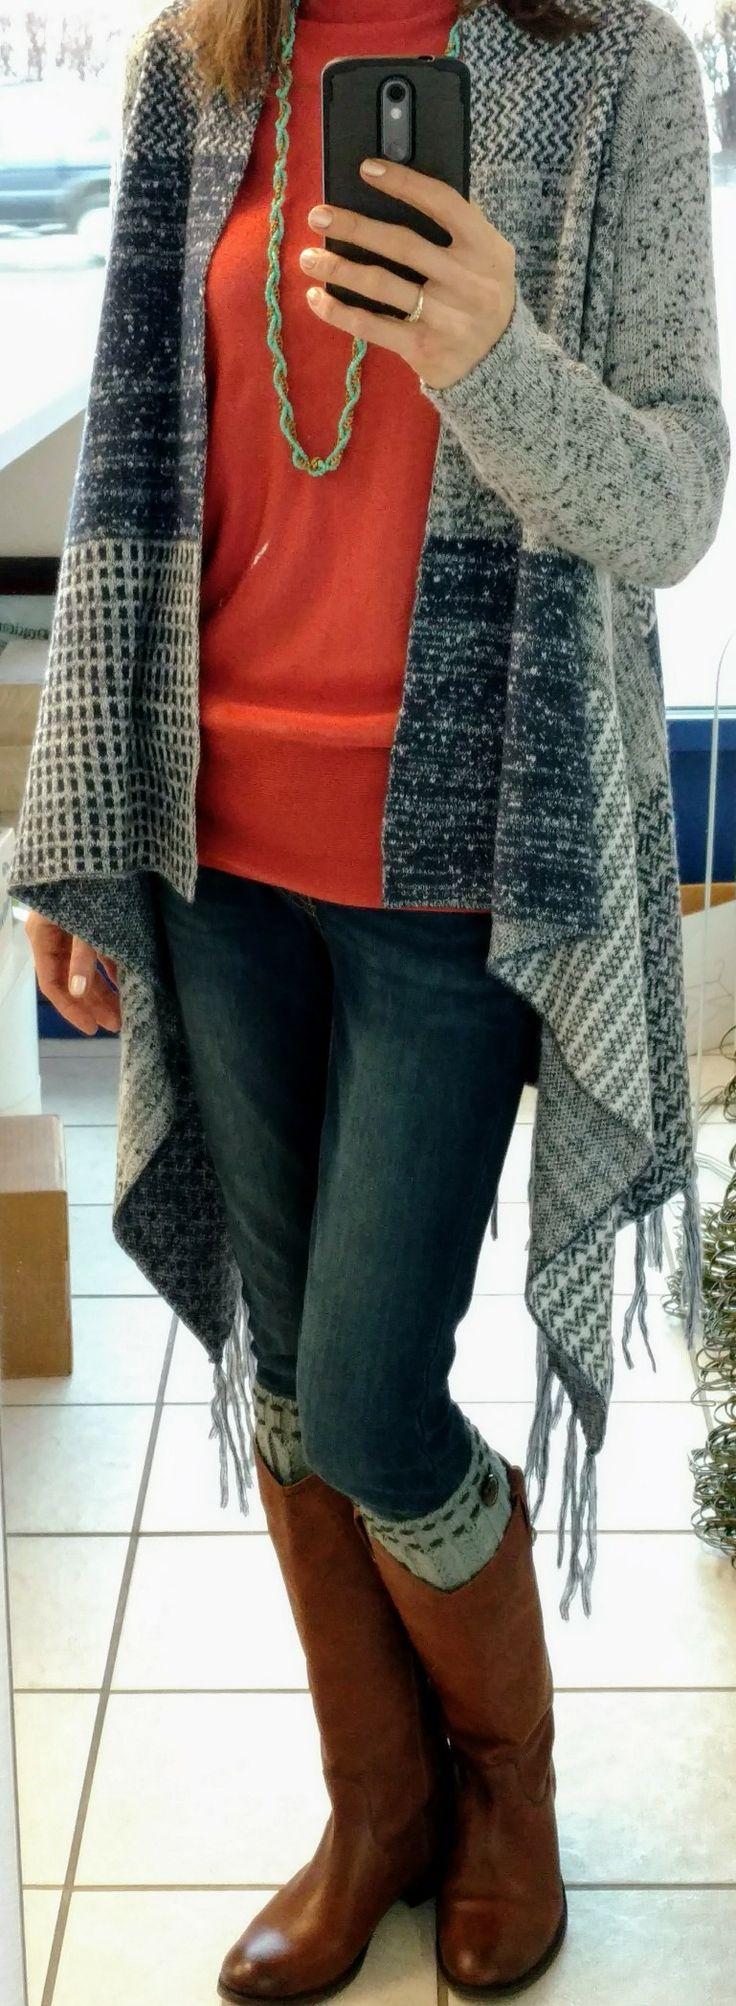 Ann Taylor shirt, Knox Rose waterfall cardigan, Levi's 535 Super Skinny jeans, Frye Melissa boots